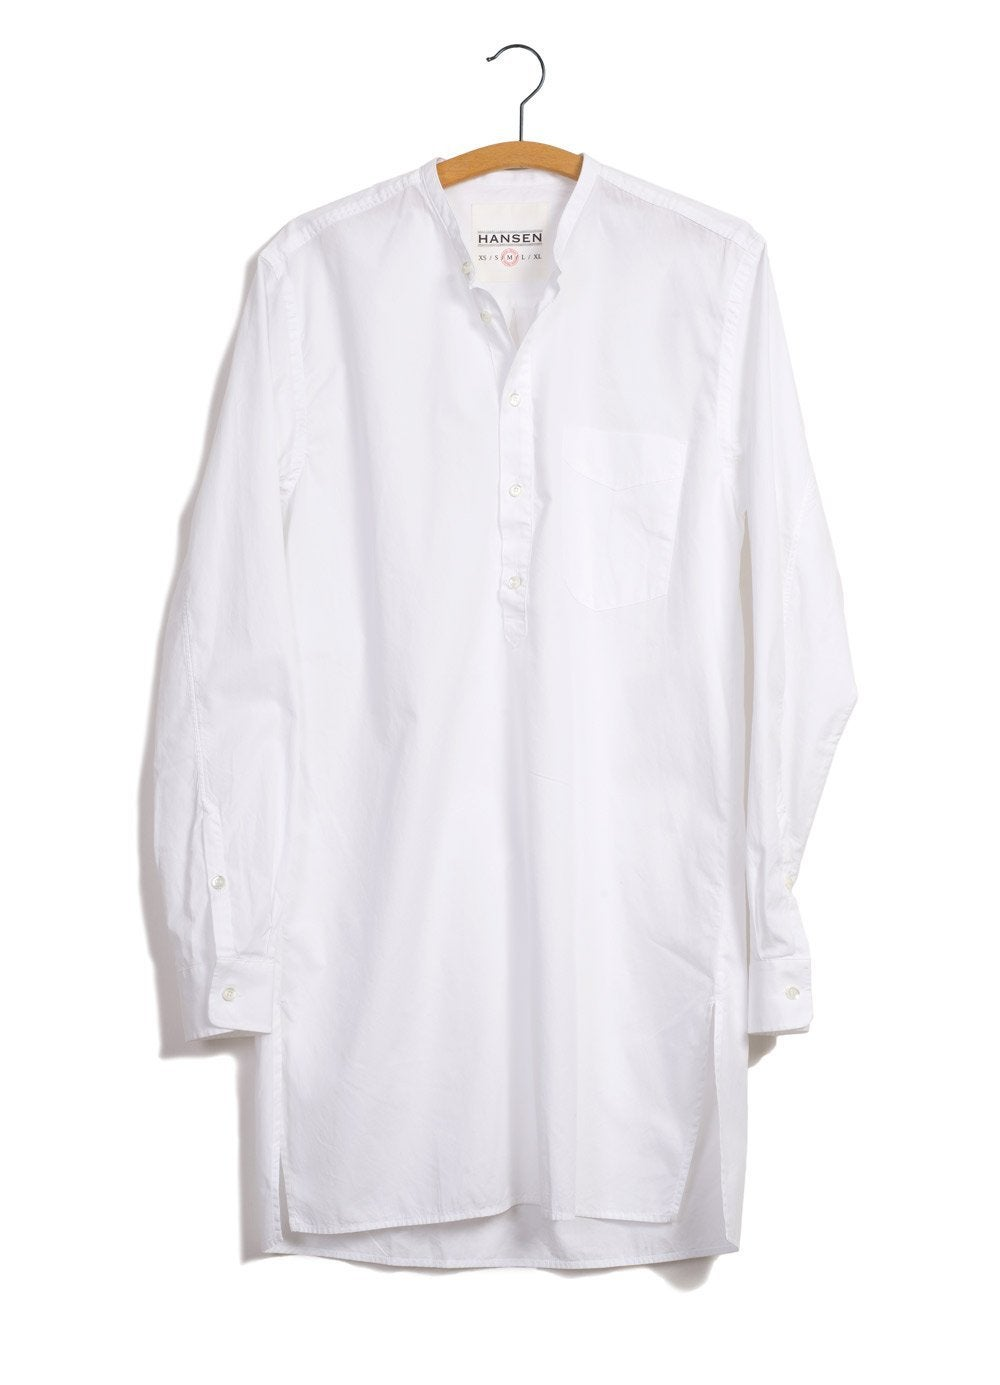 Hansen Garments ARILD | Long Collarless Pull-on shirt | white, black, sea